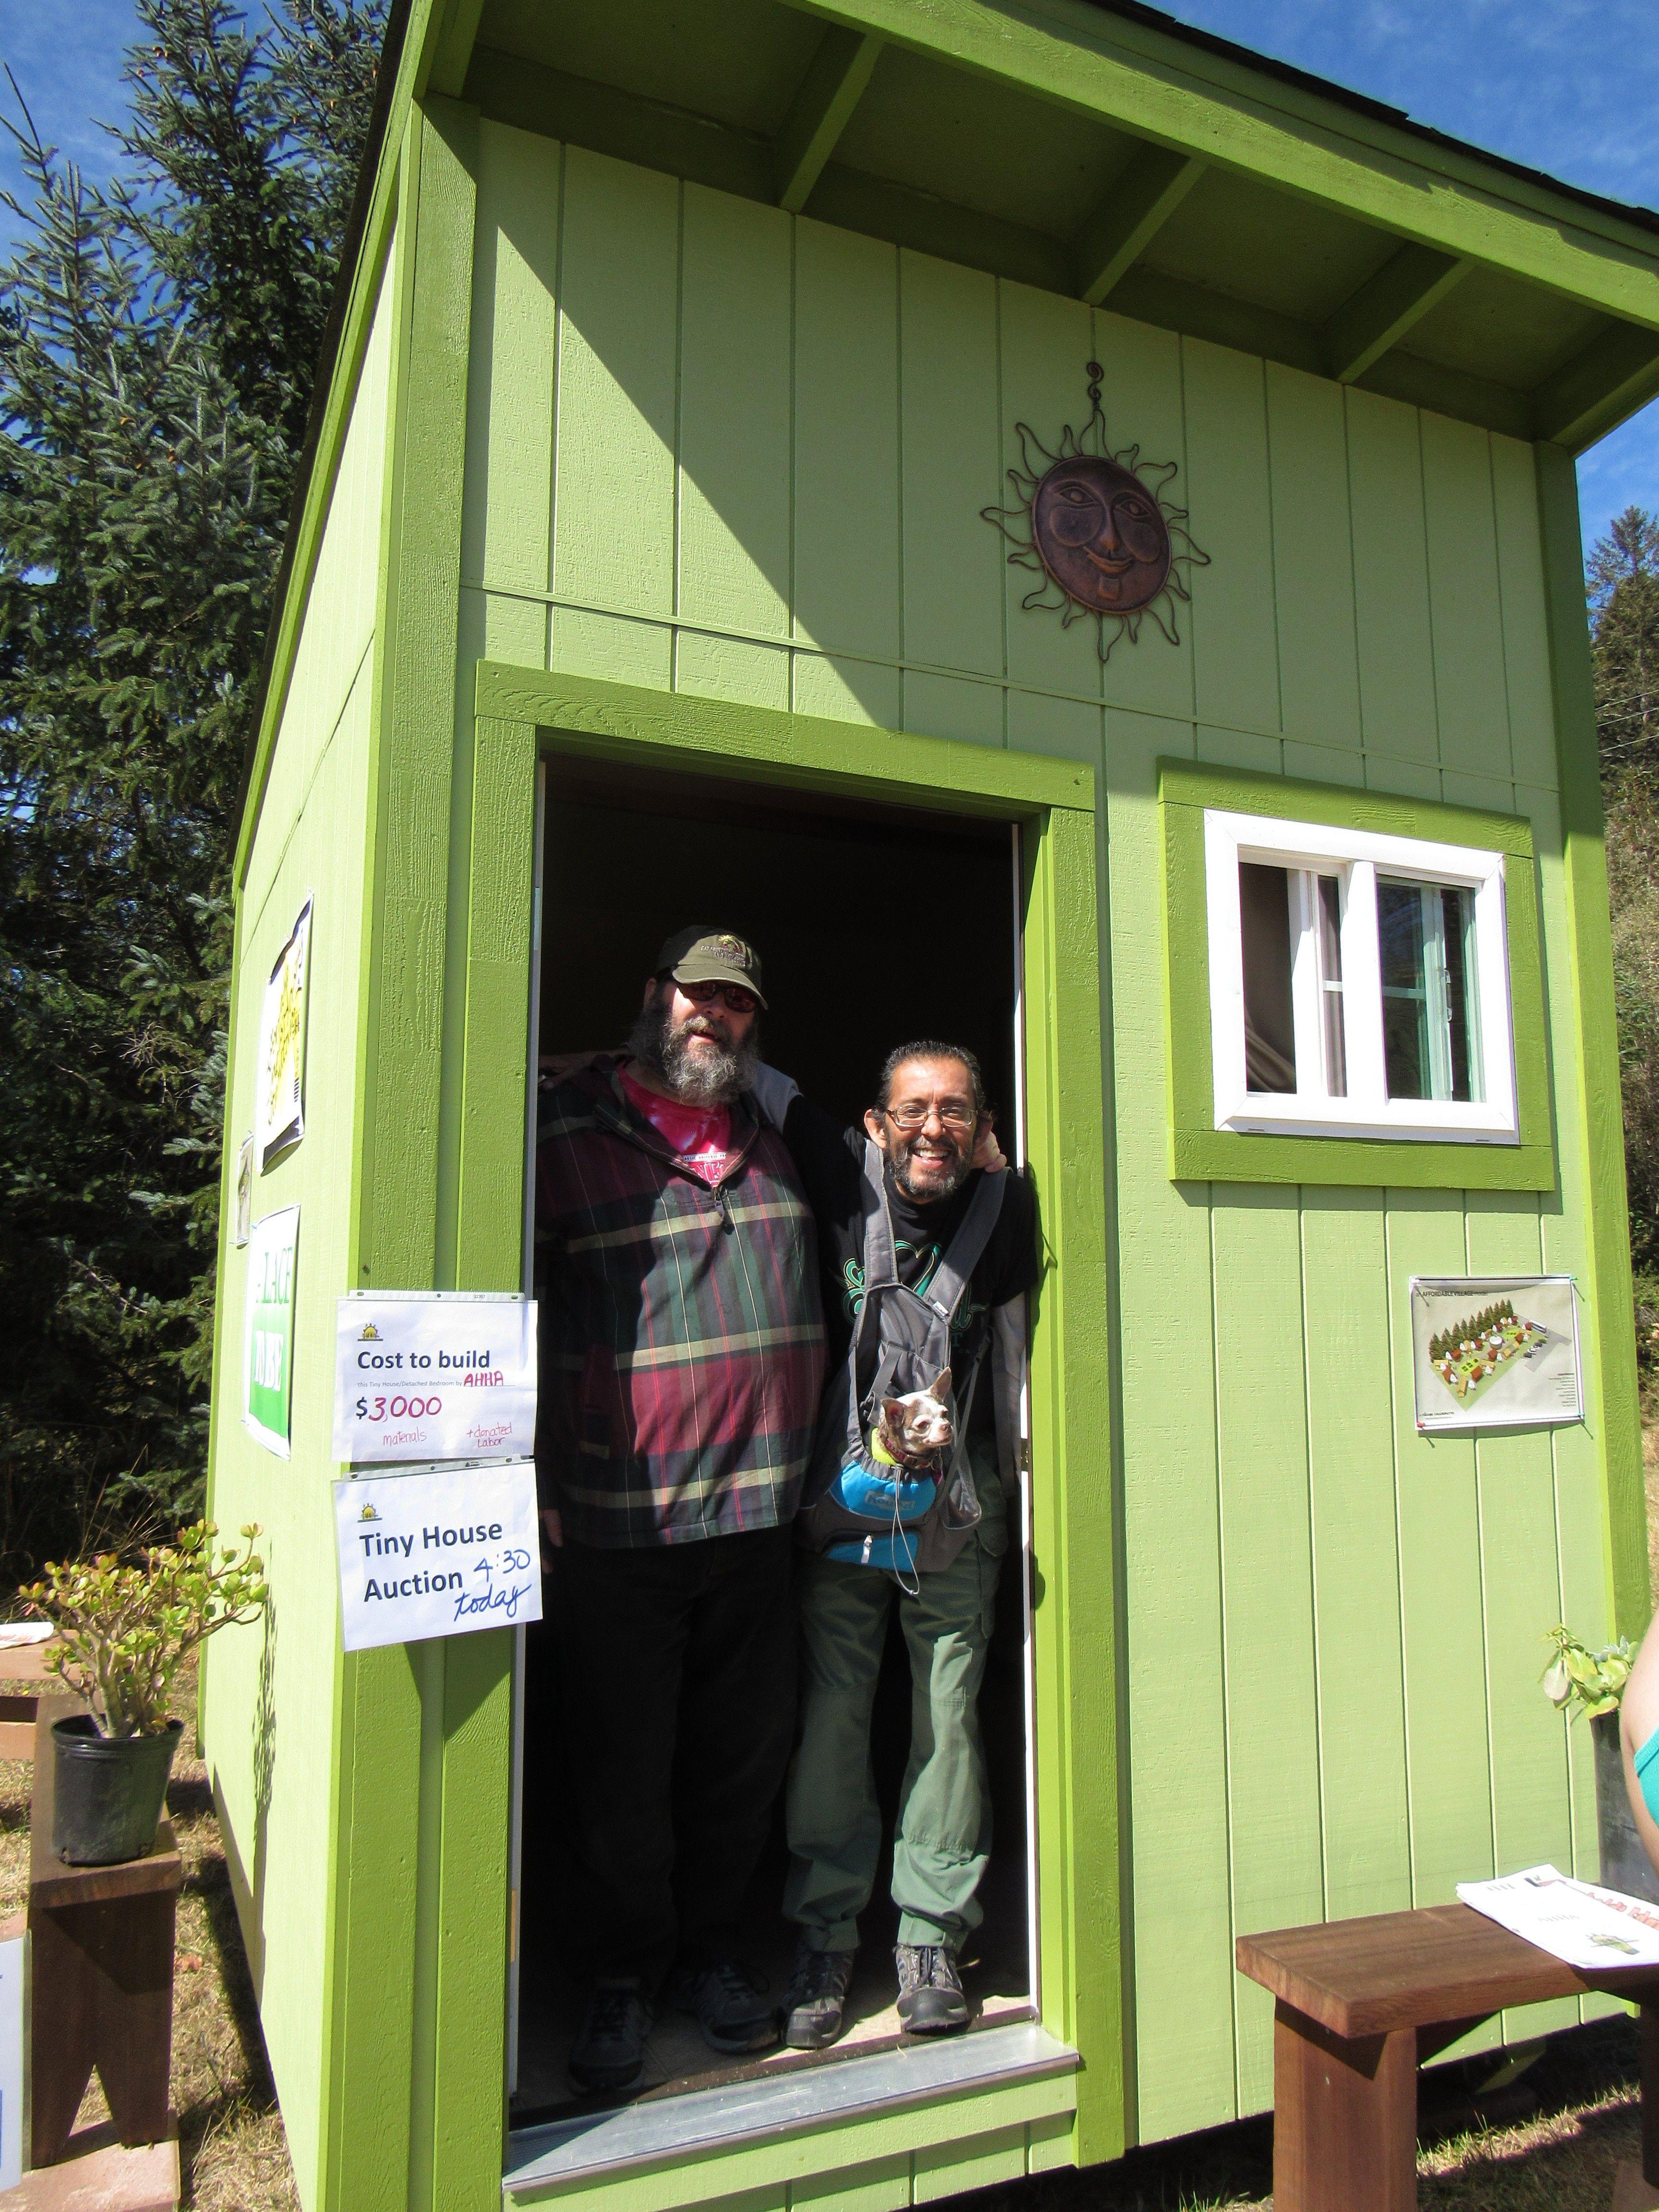 tiny house expo. Big Turnout For Affordable Homeless Housing Alternatives (AHHA) Tiny House Expo